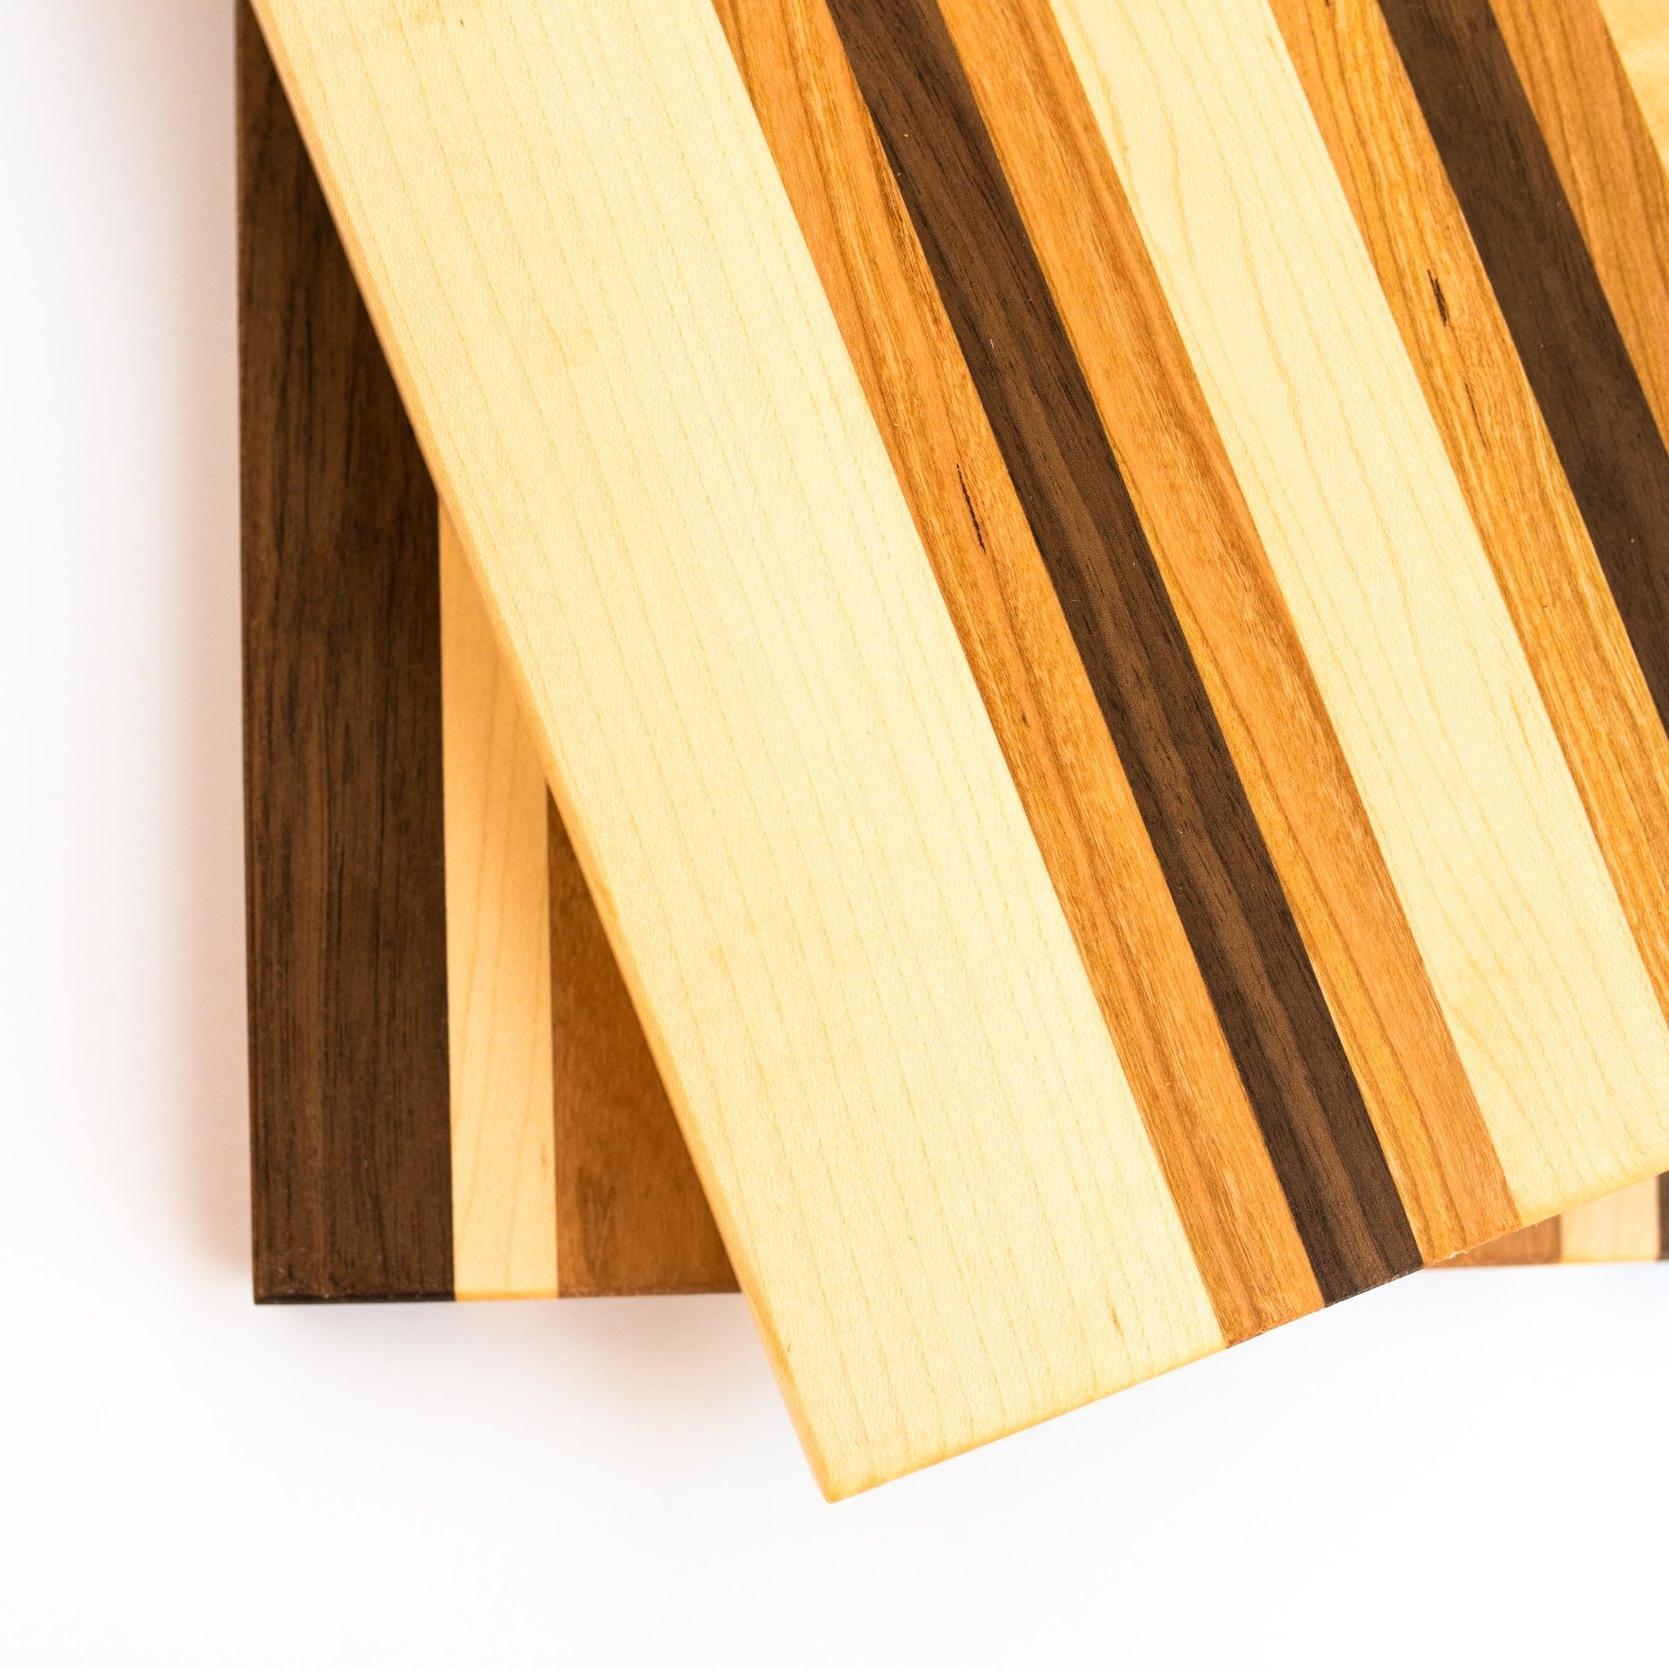 cuttingboardsamples-24.jpg